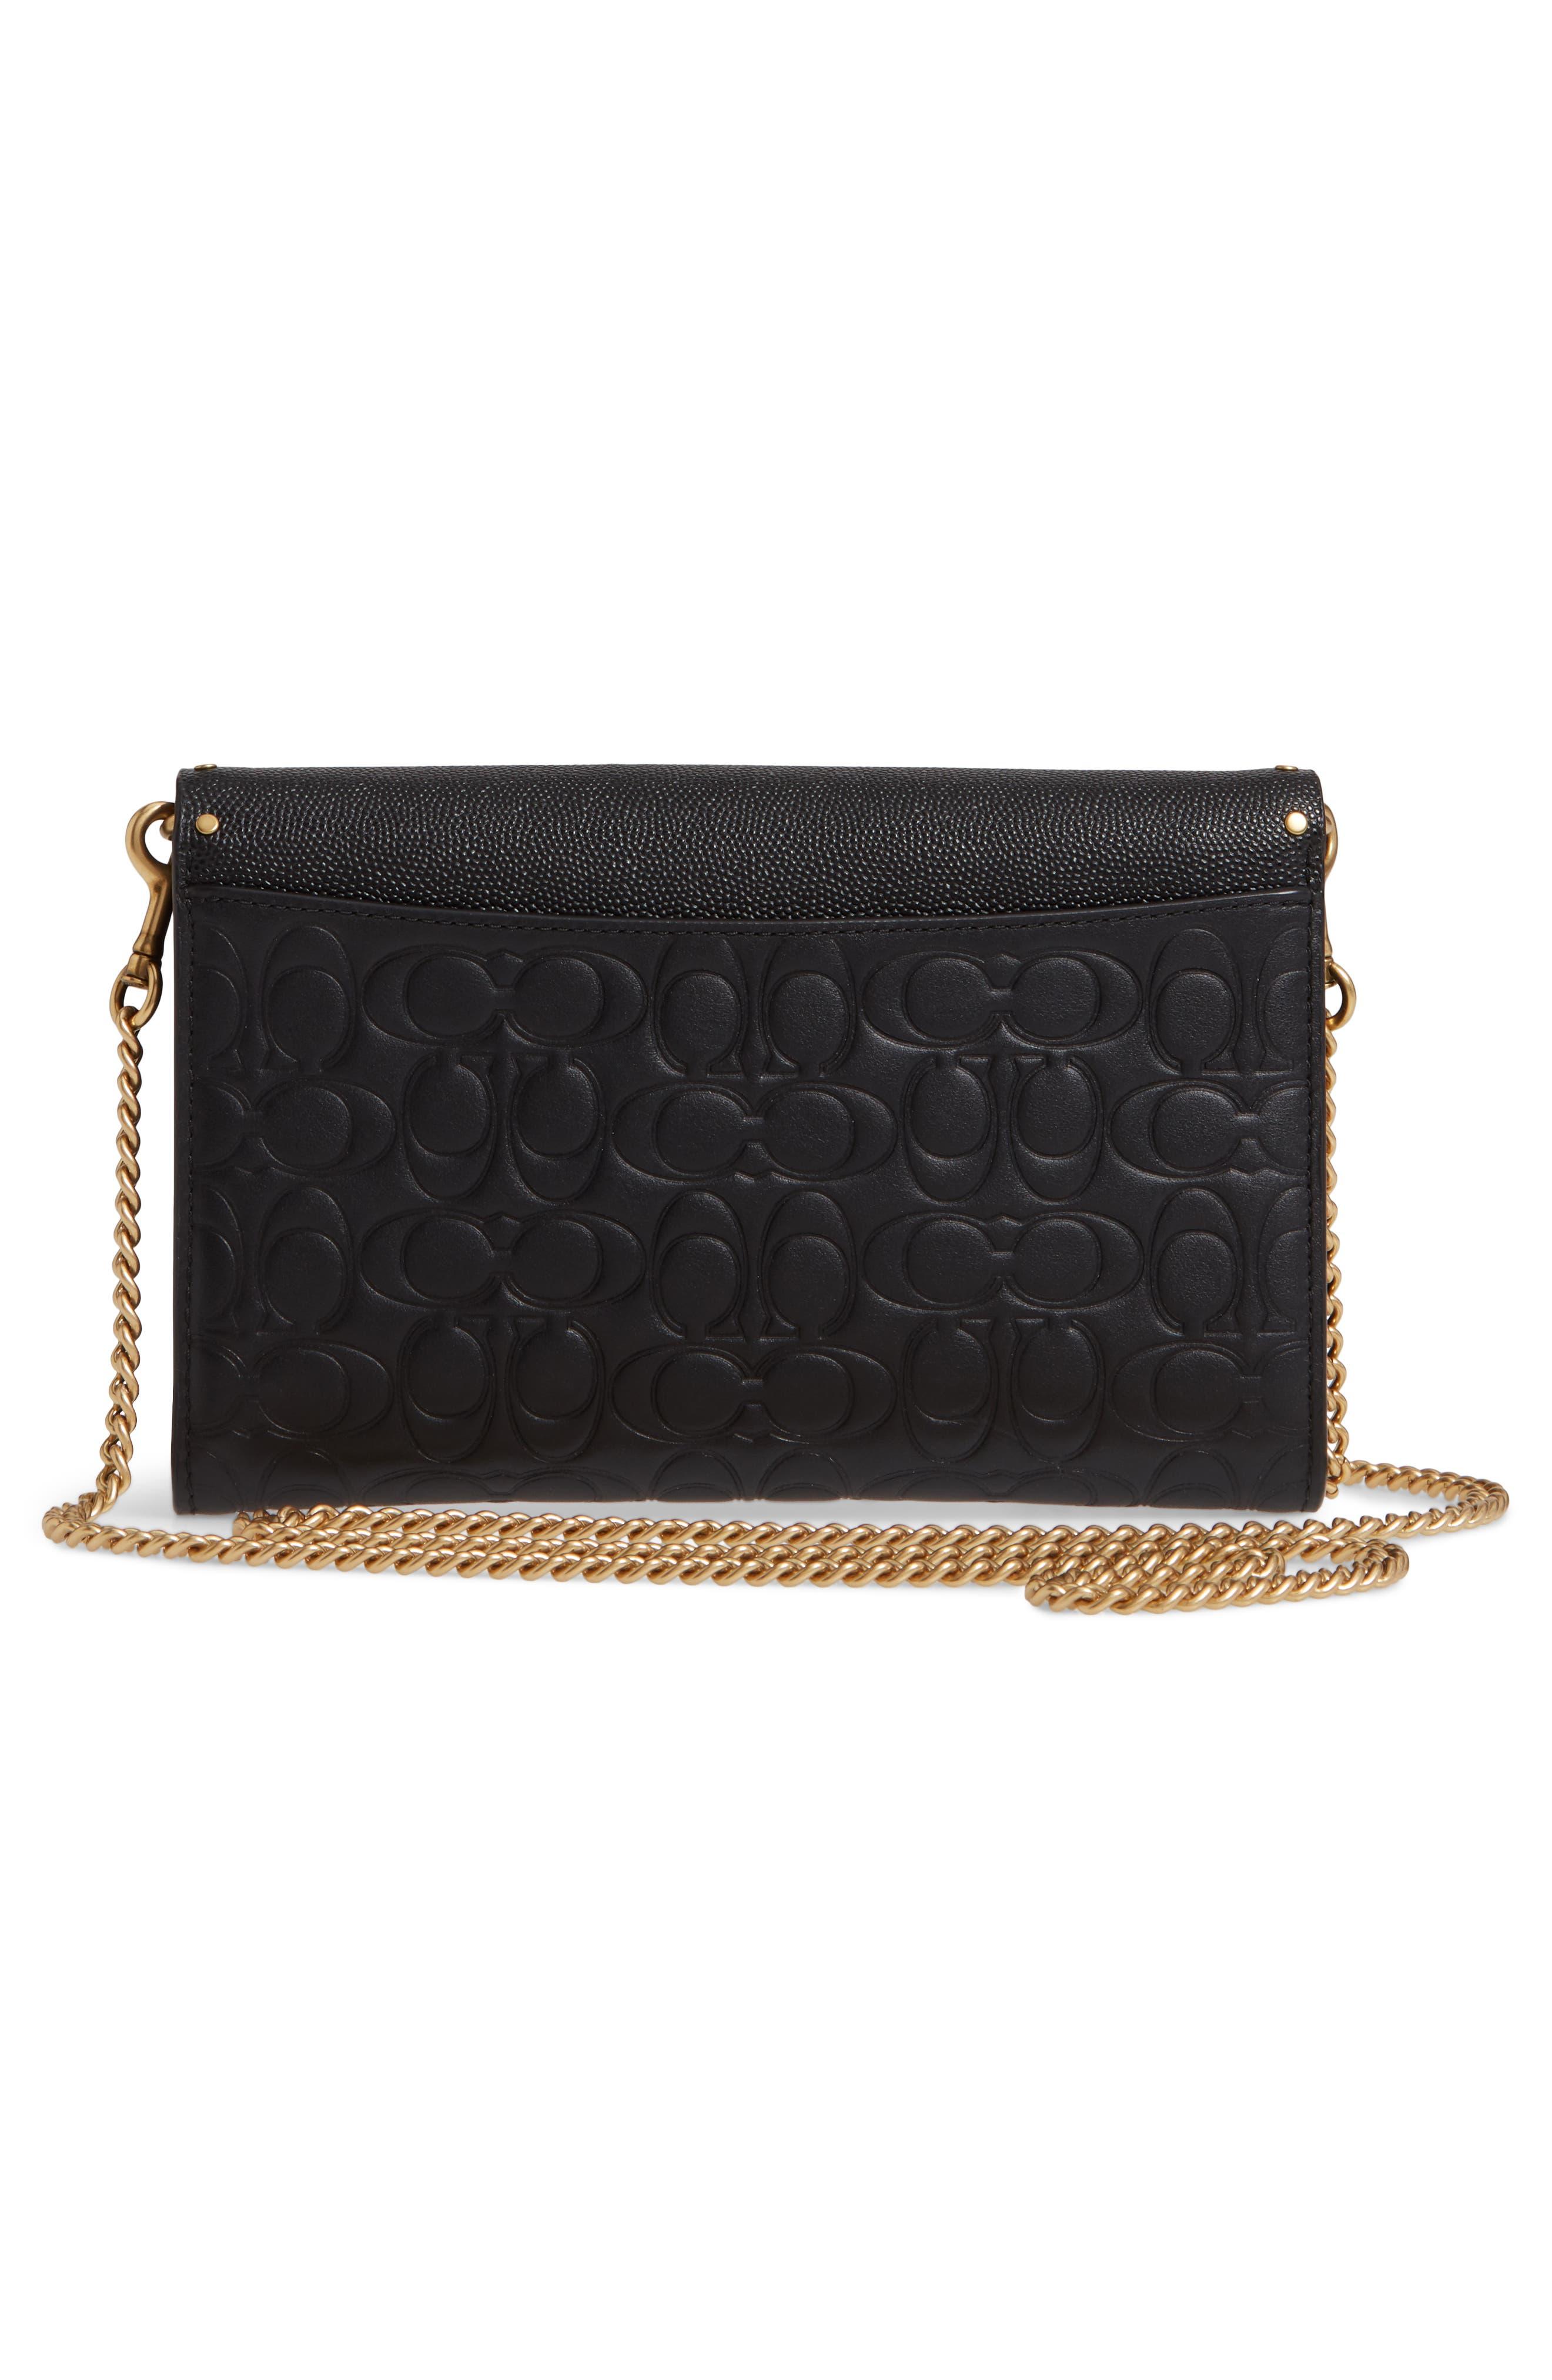 COACH, Marlow Rivets Leather Crossbody Bag, Alternate thumbnail 4, color, BLACK